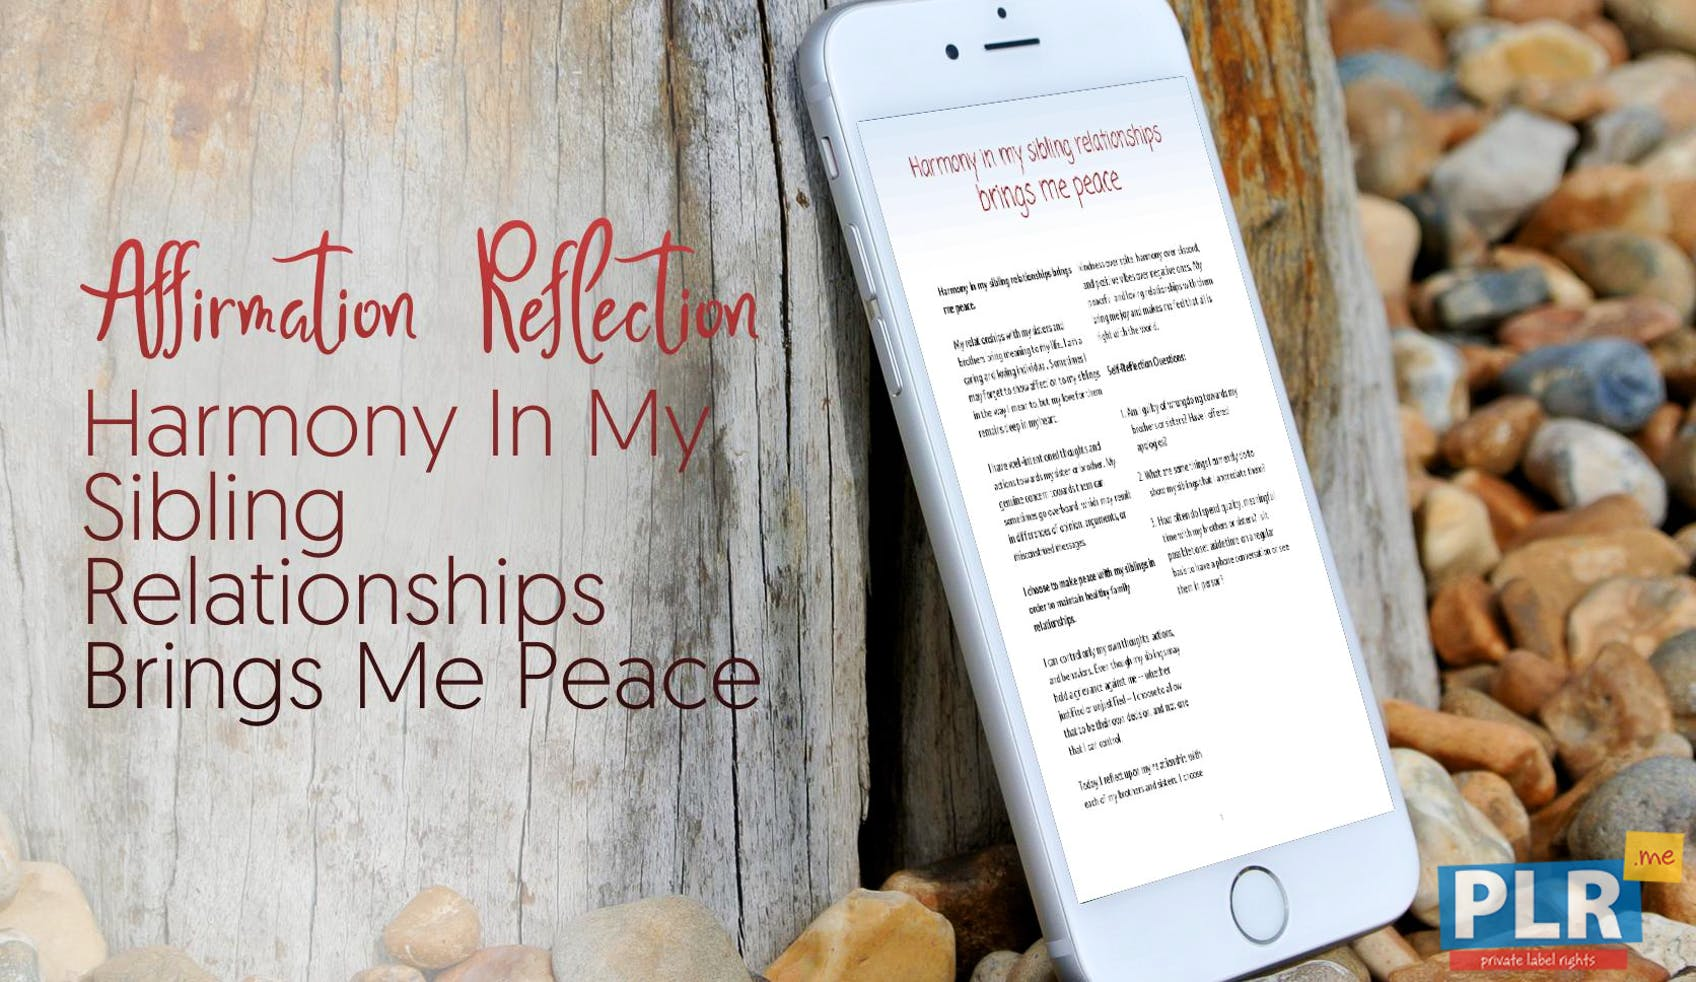 Harmony In My Sibling Relationships Brings Me Peace